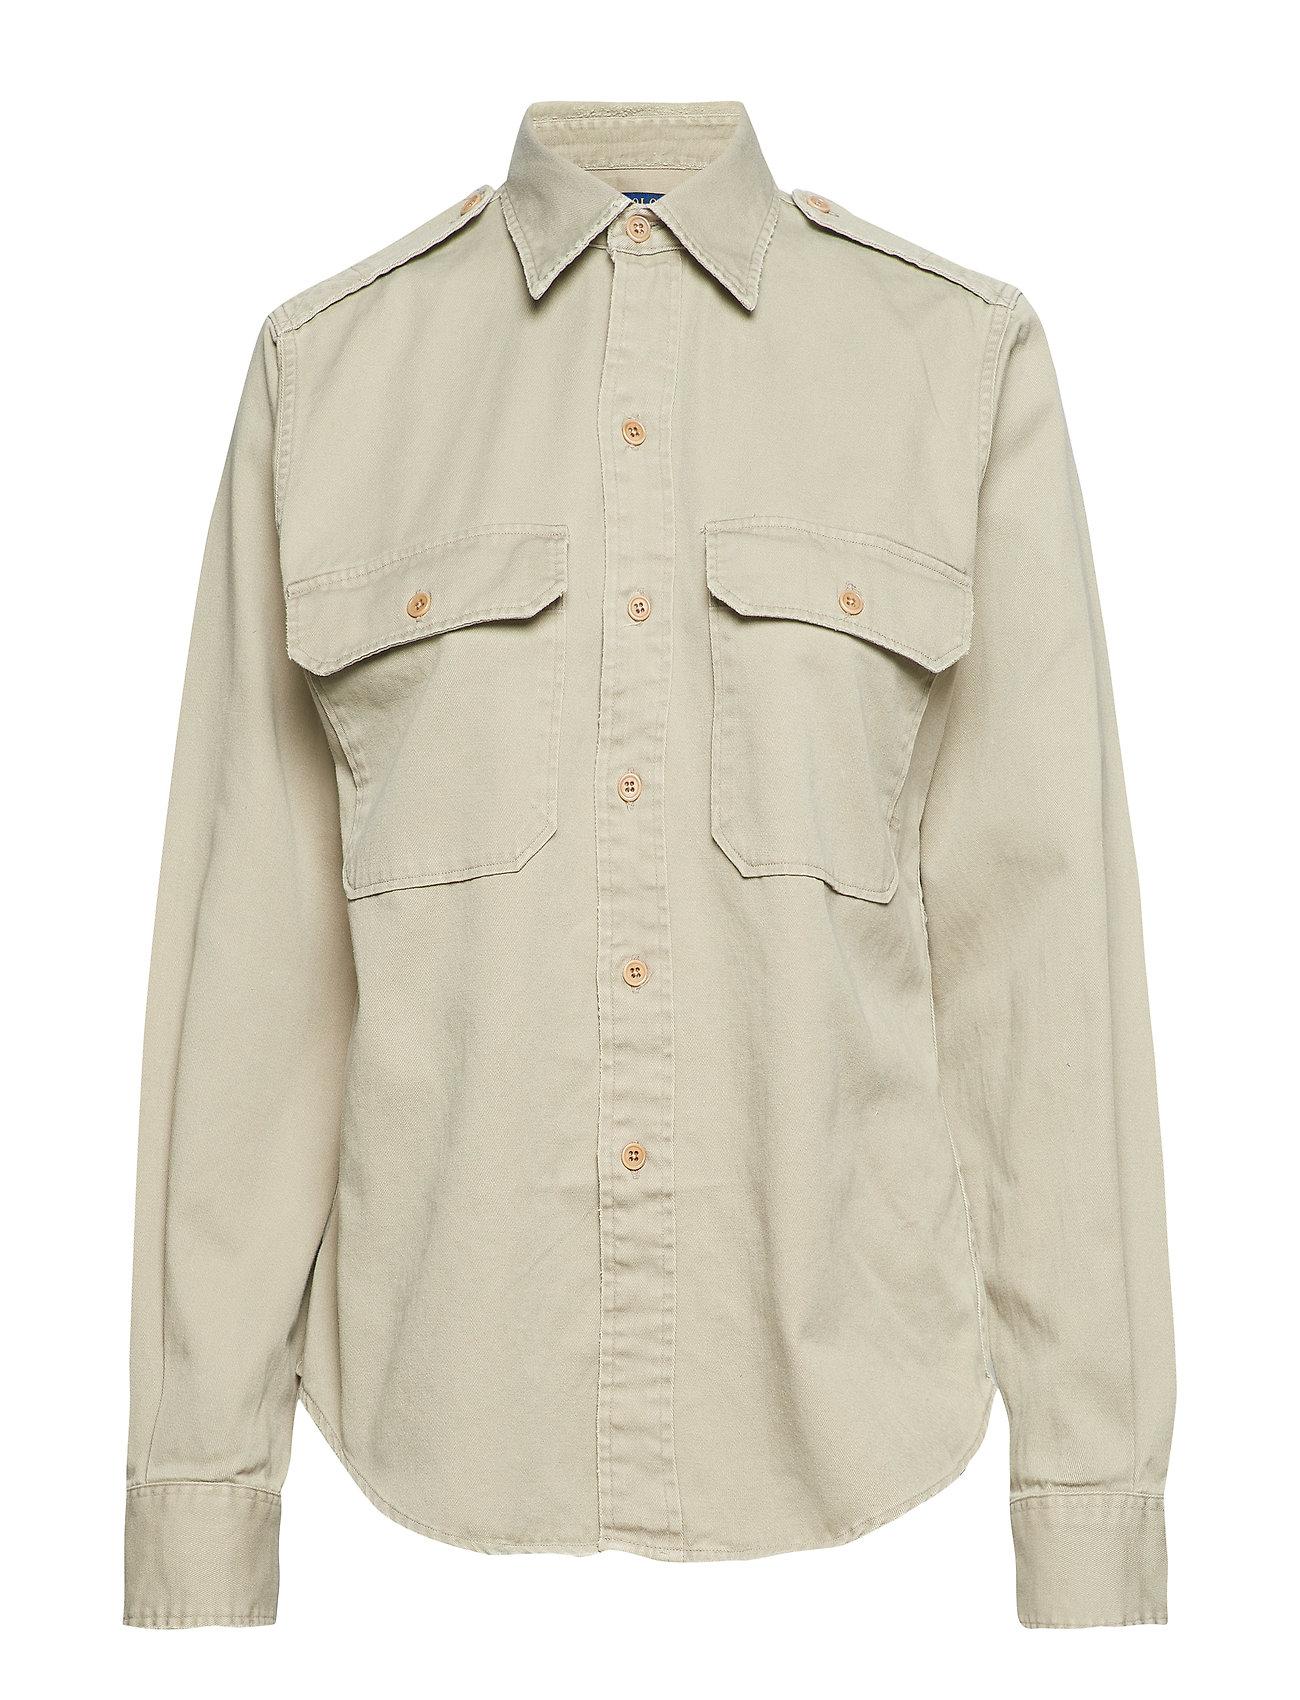 Polo Ralph Lauren Twill Military Shirt